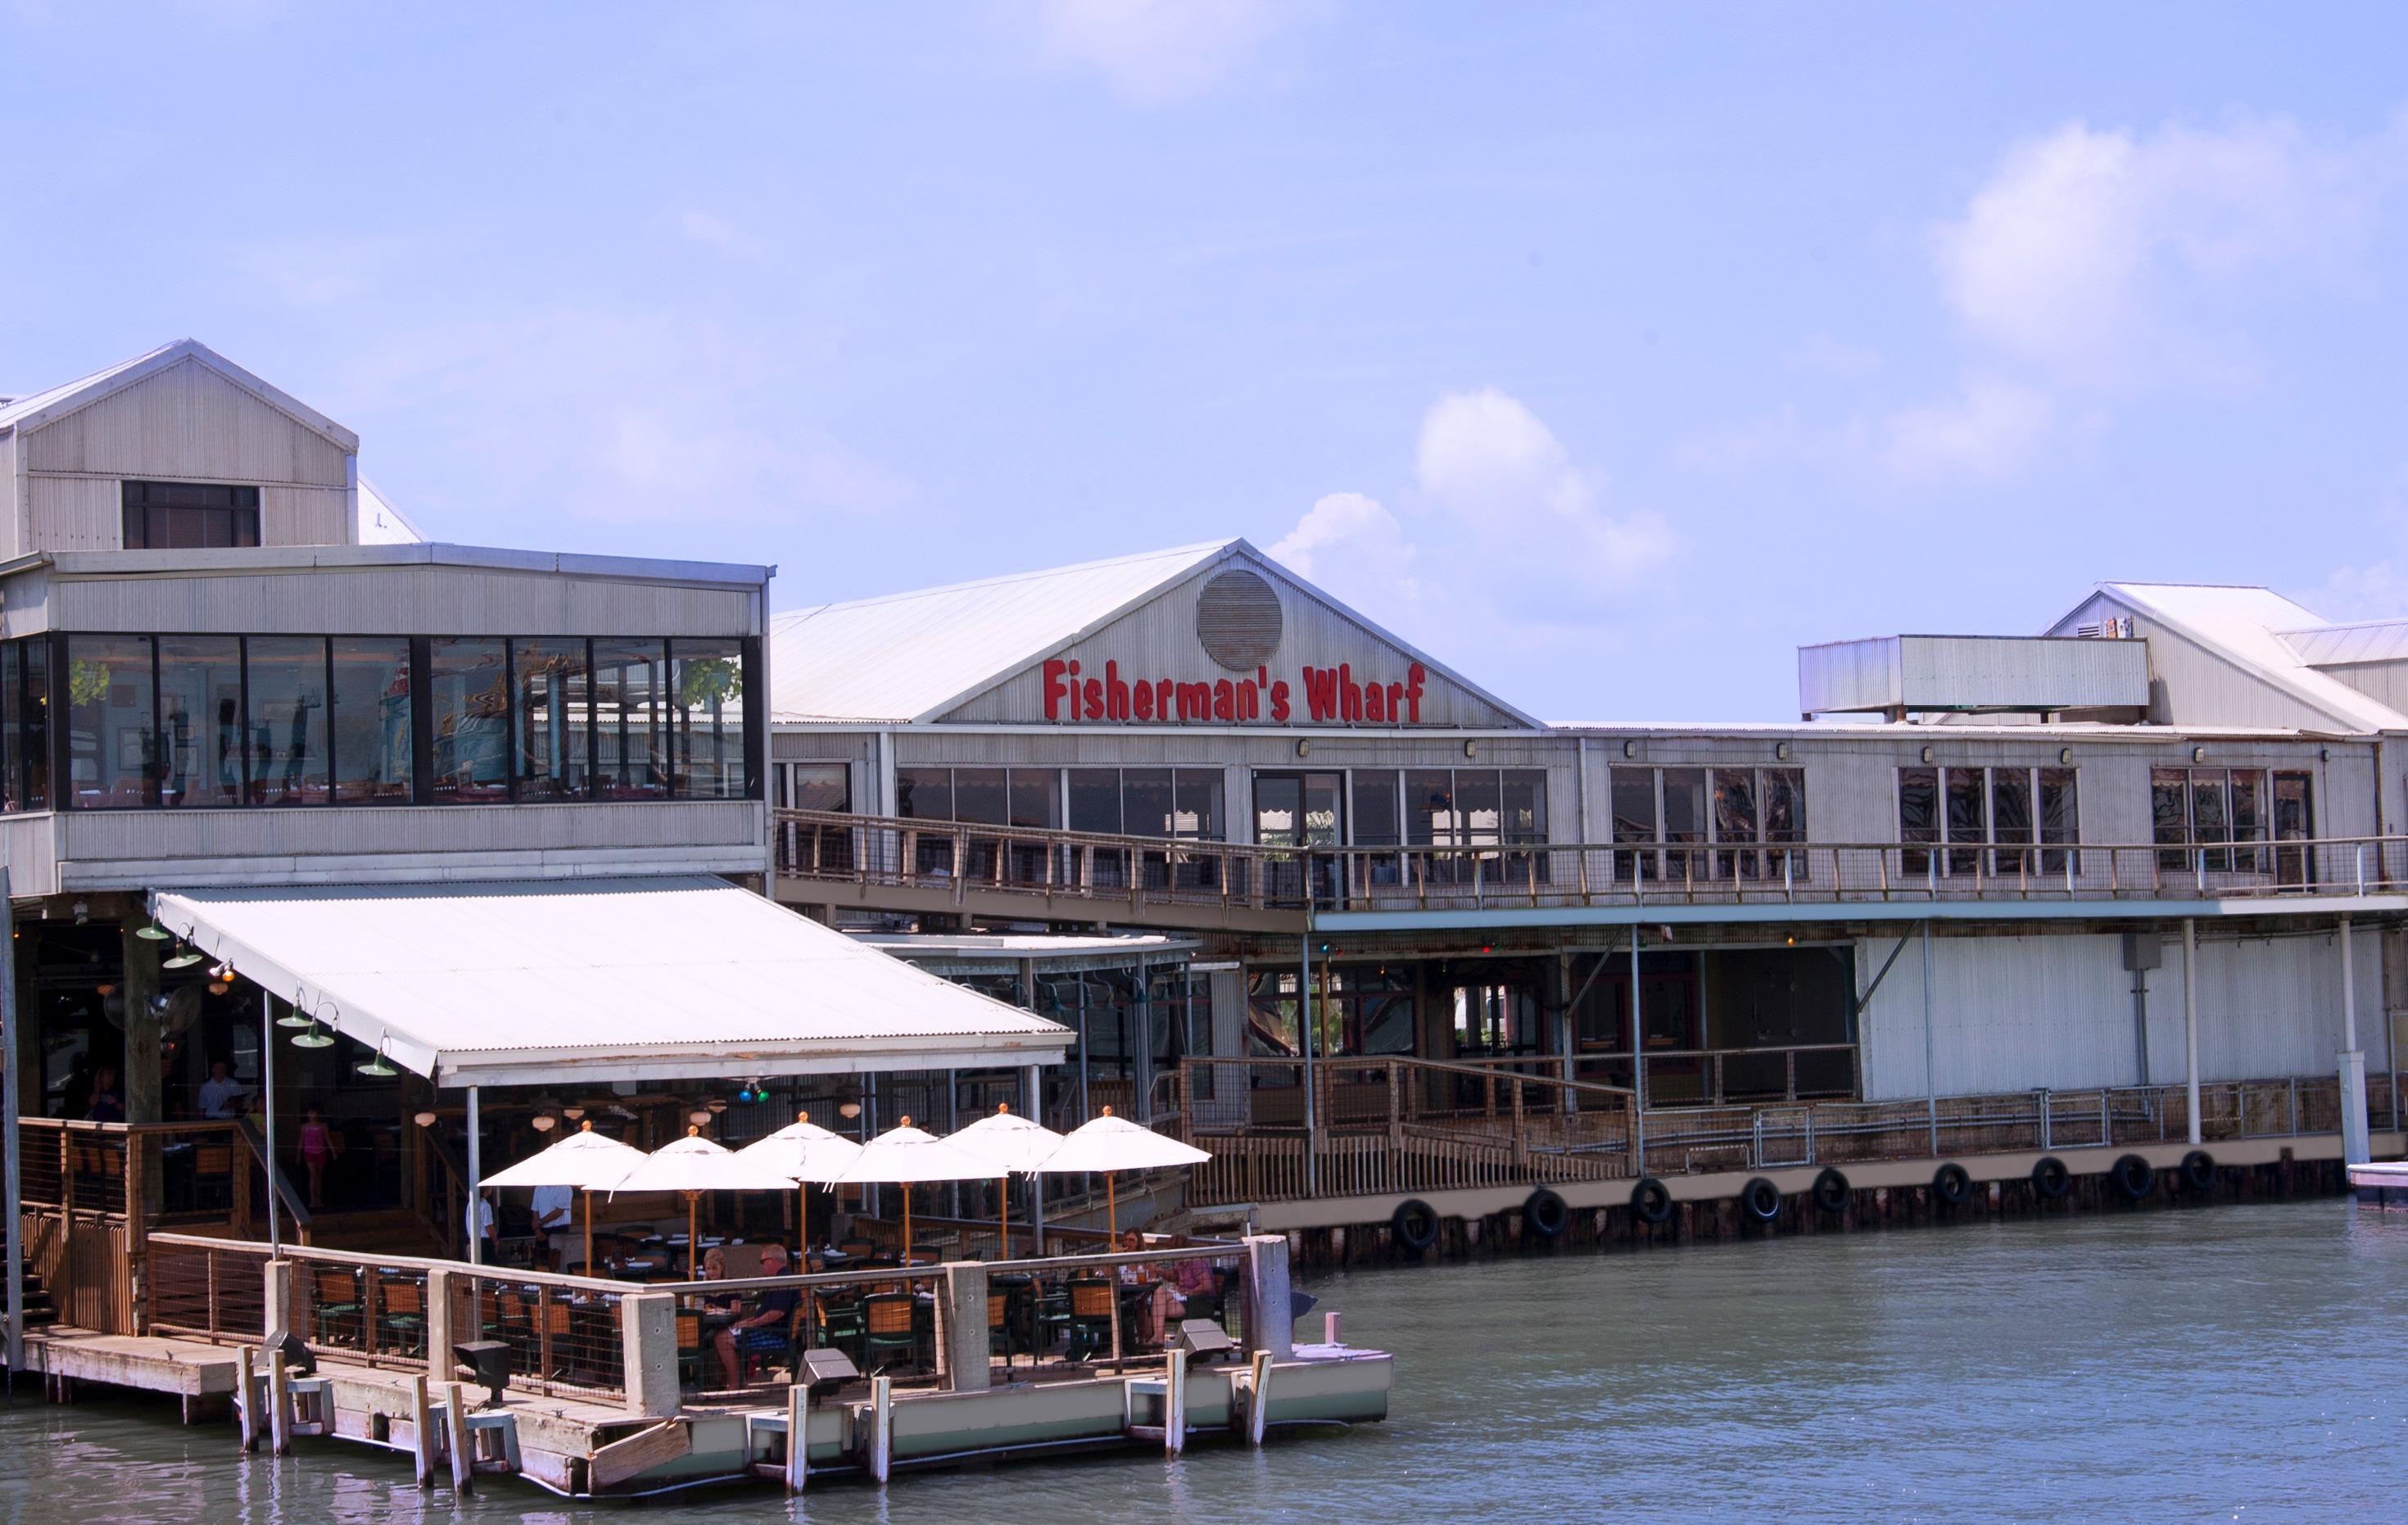 Fisherman's Wharf image 0